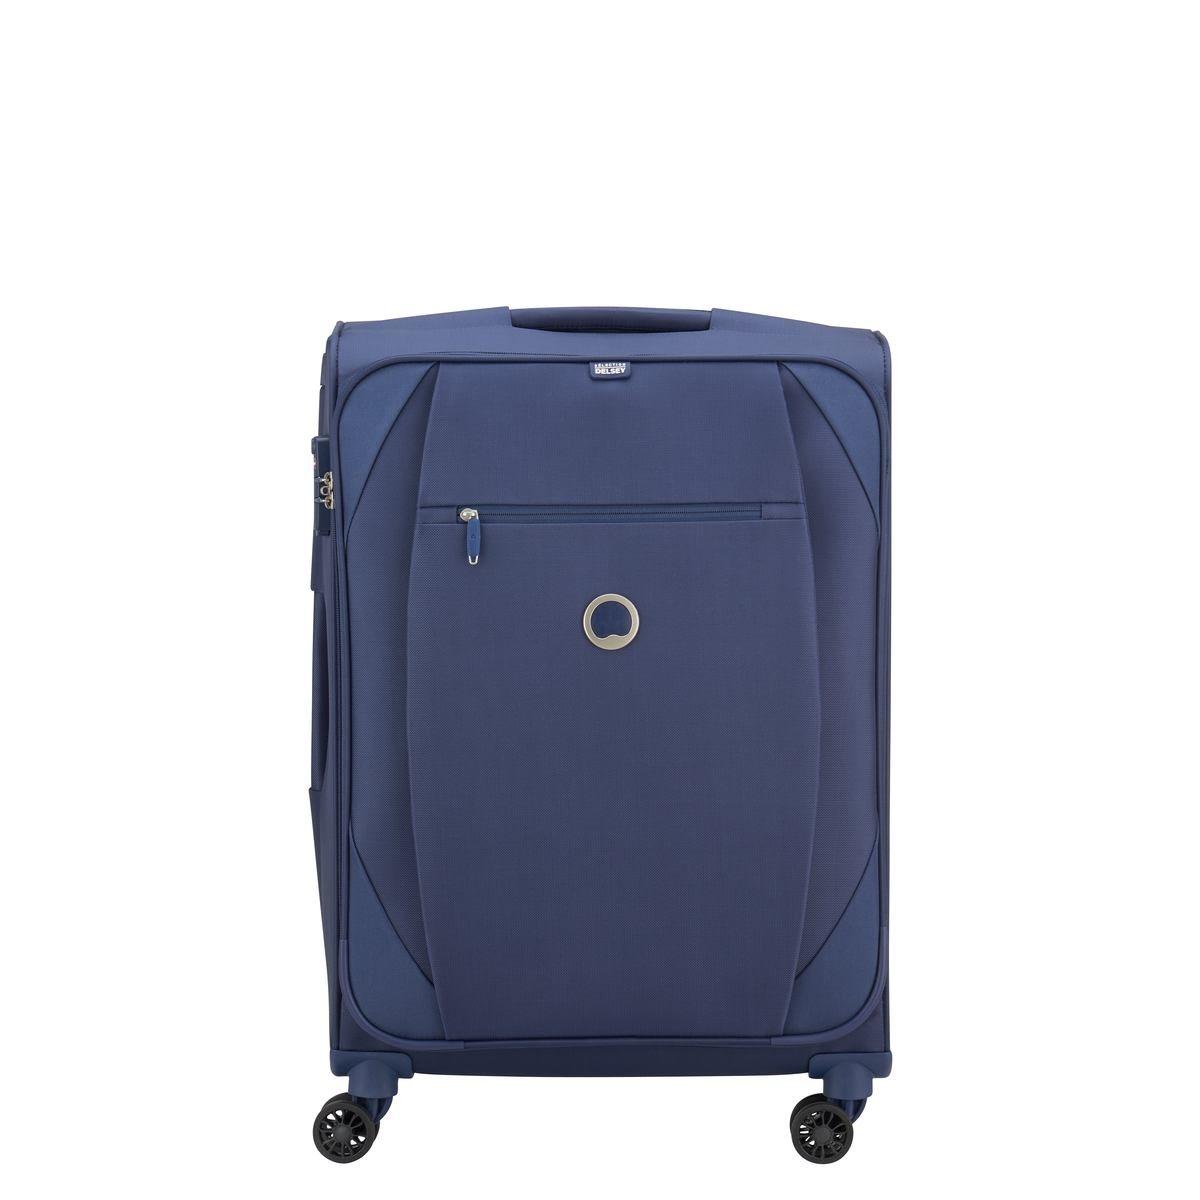 Delsey Βαλίτσα μεσαία 67x43x26cm σειρά Rami Blue